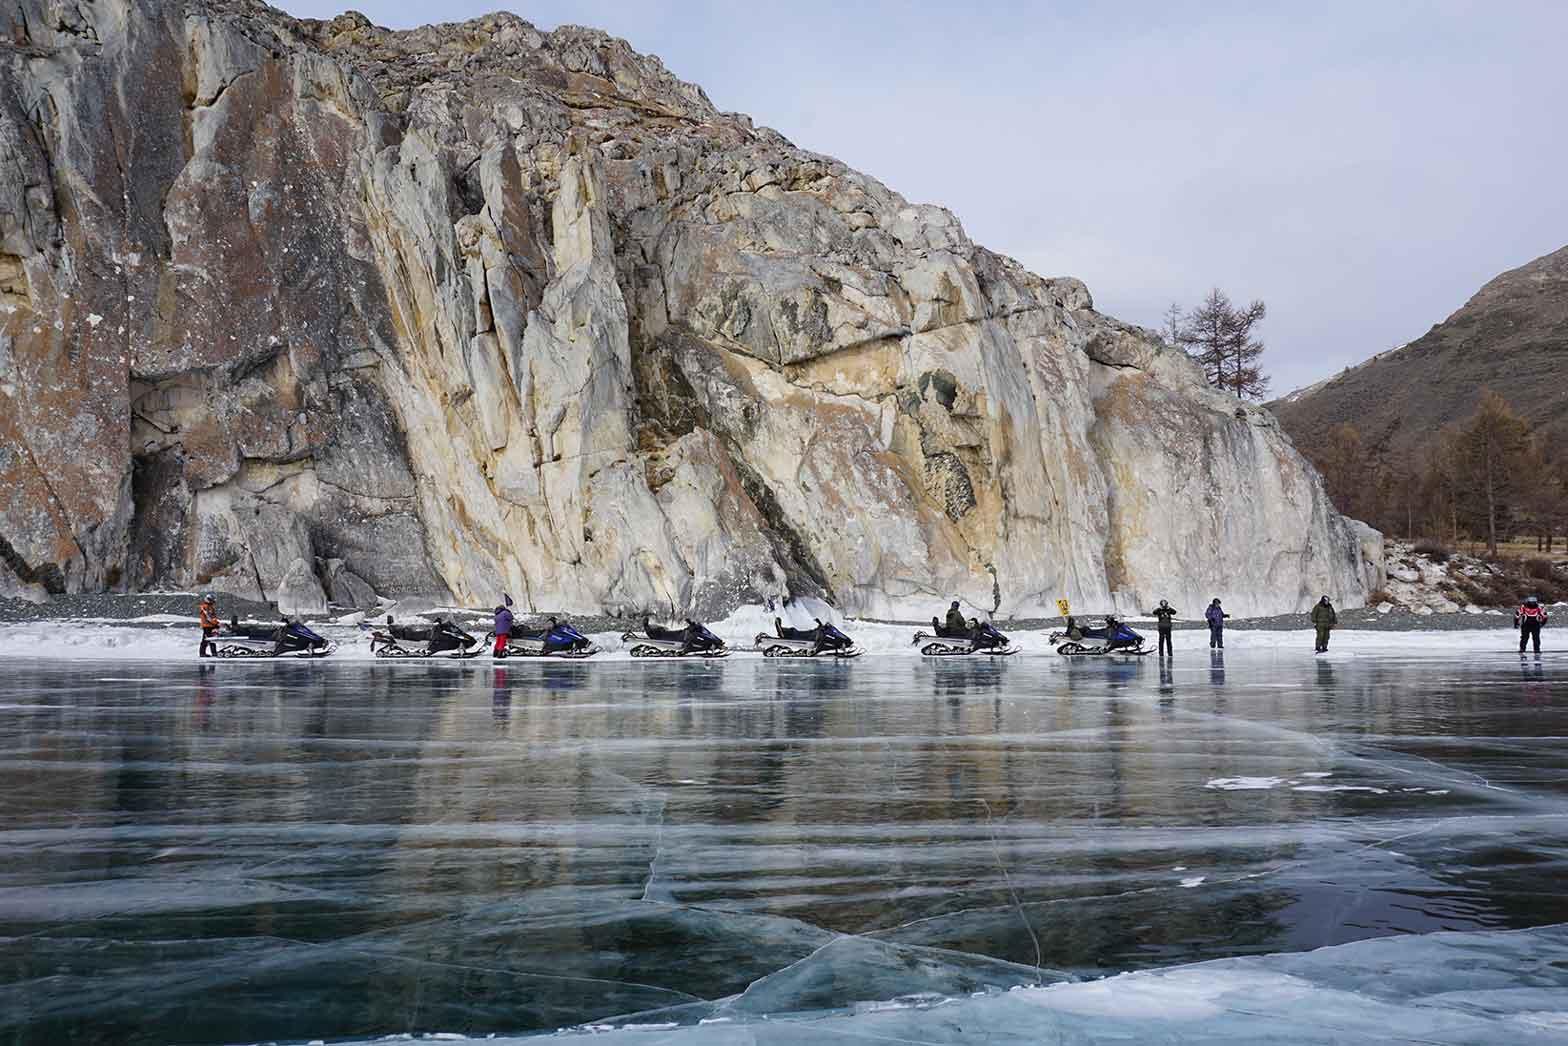 Riders on the ice